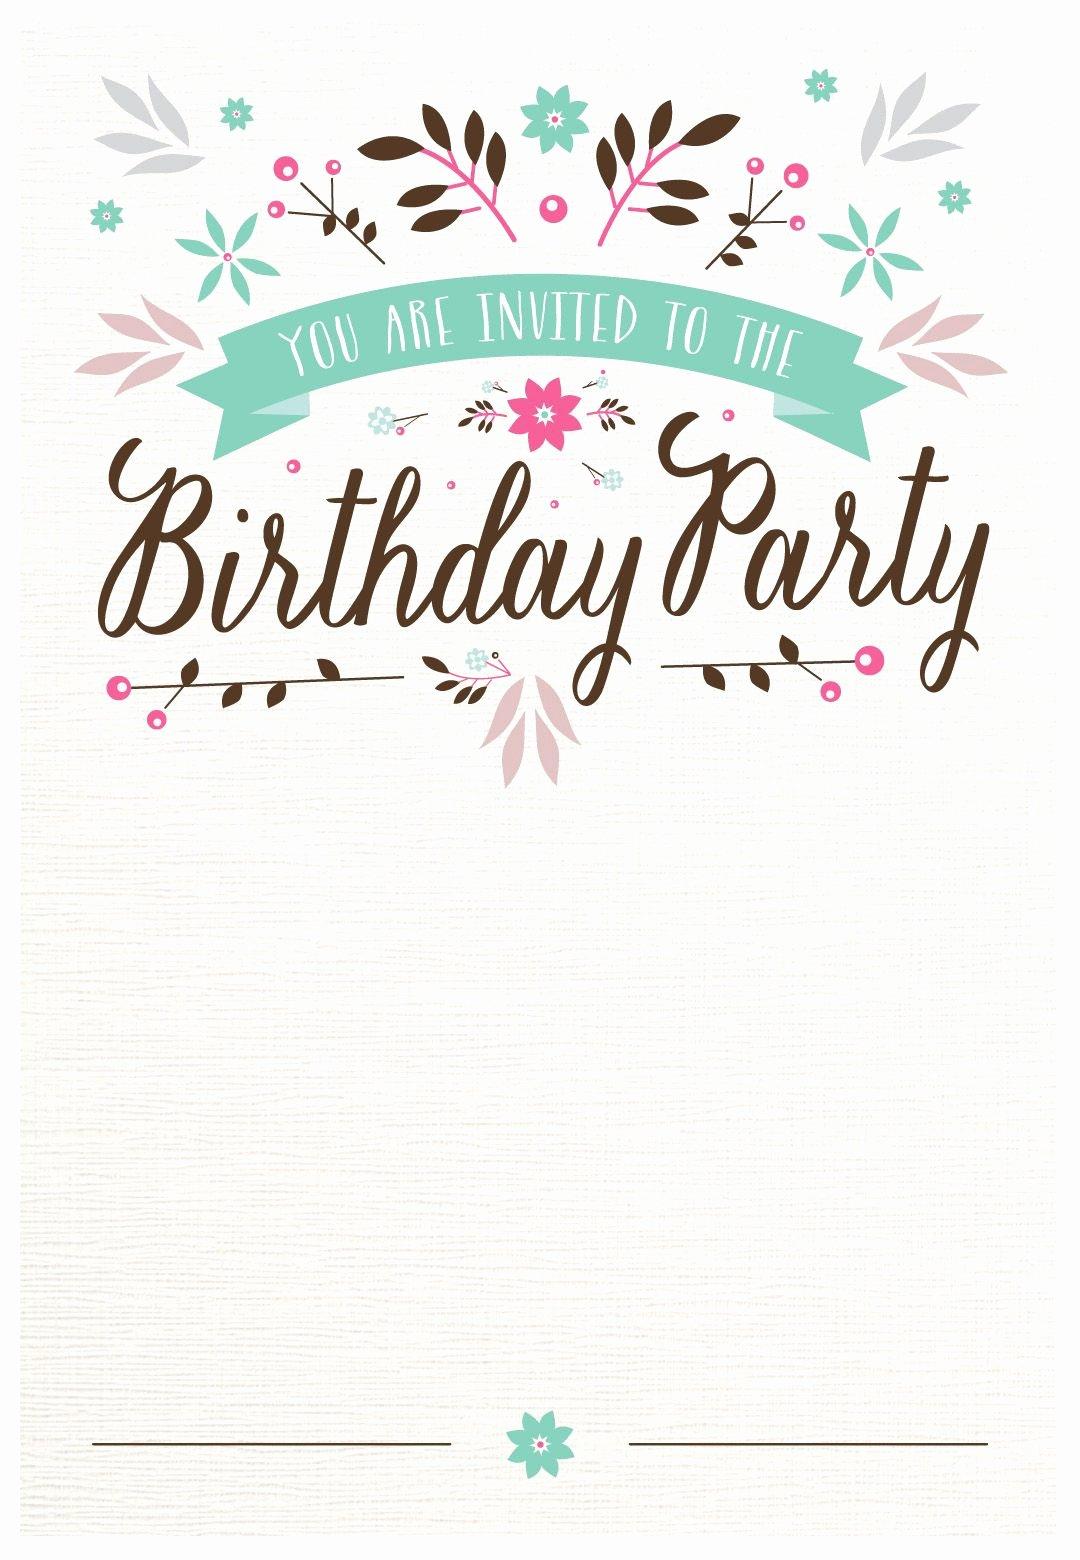 Free Printable Birthday Invitation Templates Fresh Flat Floral Free Printable Birthday Invitation Template